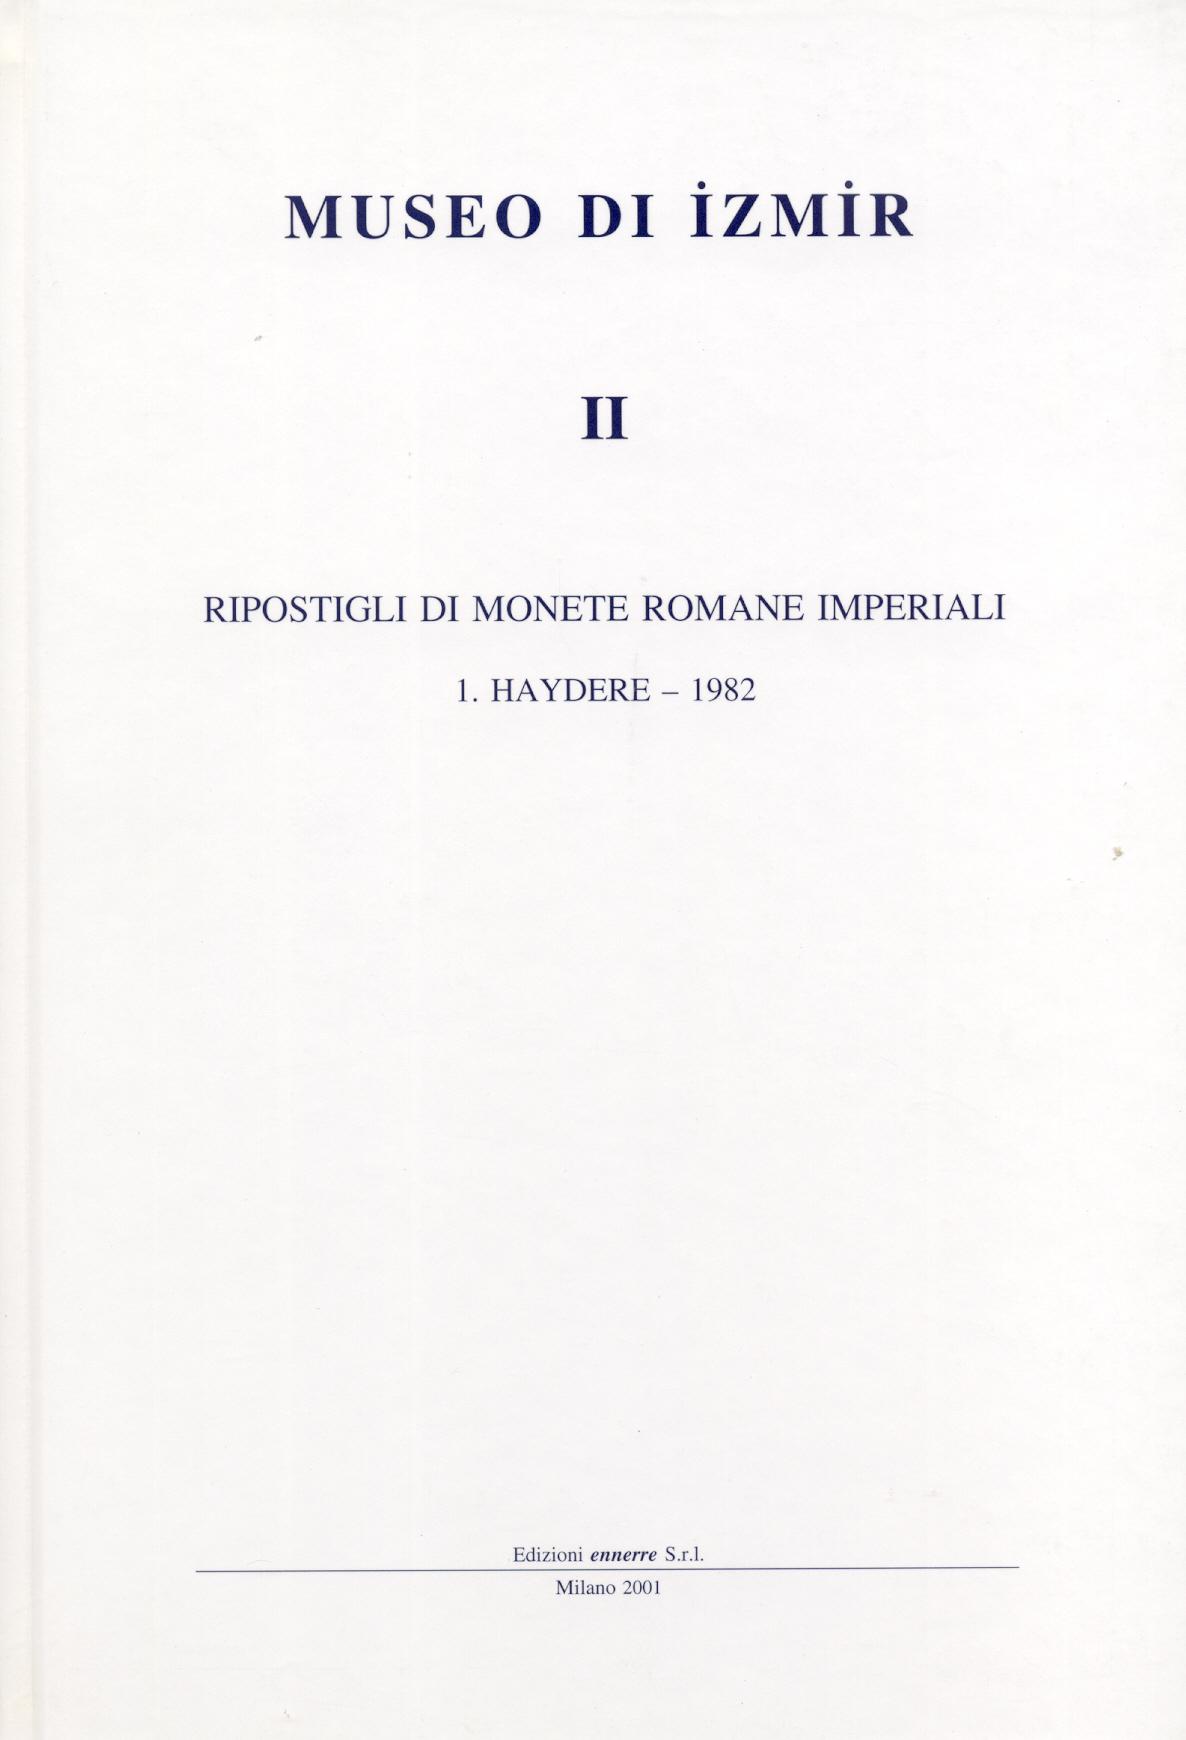 2001 ANCIENT COINS - MUSEO IZMIR - MONETE ROMANE IMPERIALI. Hortfund NEU